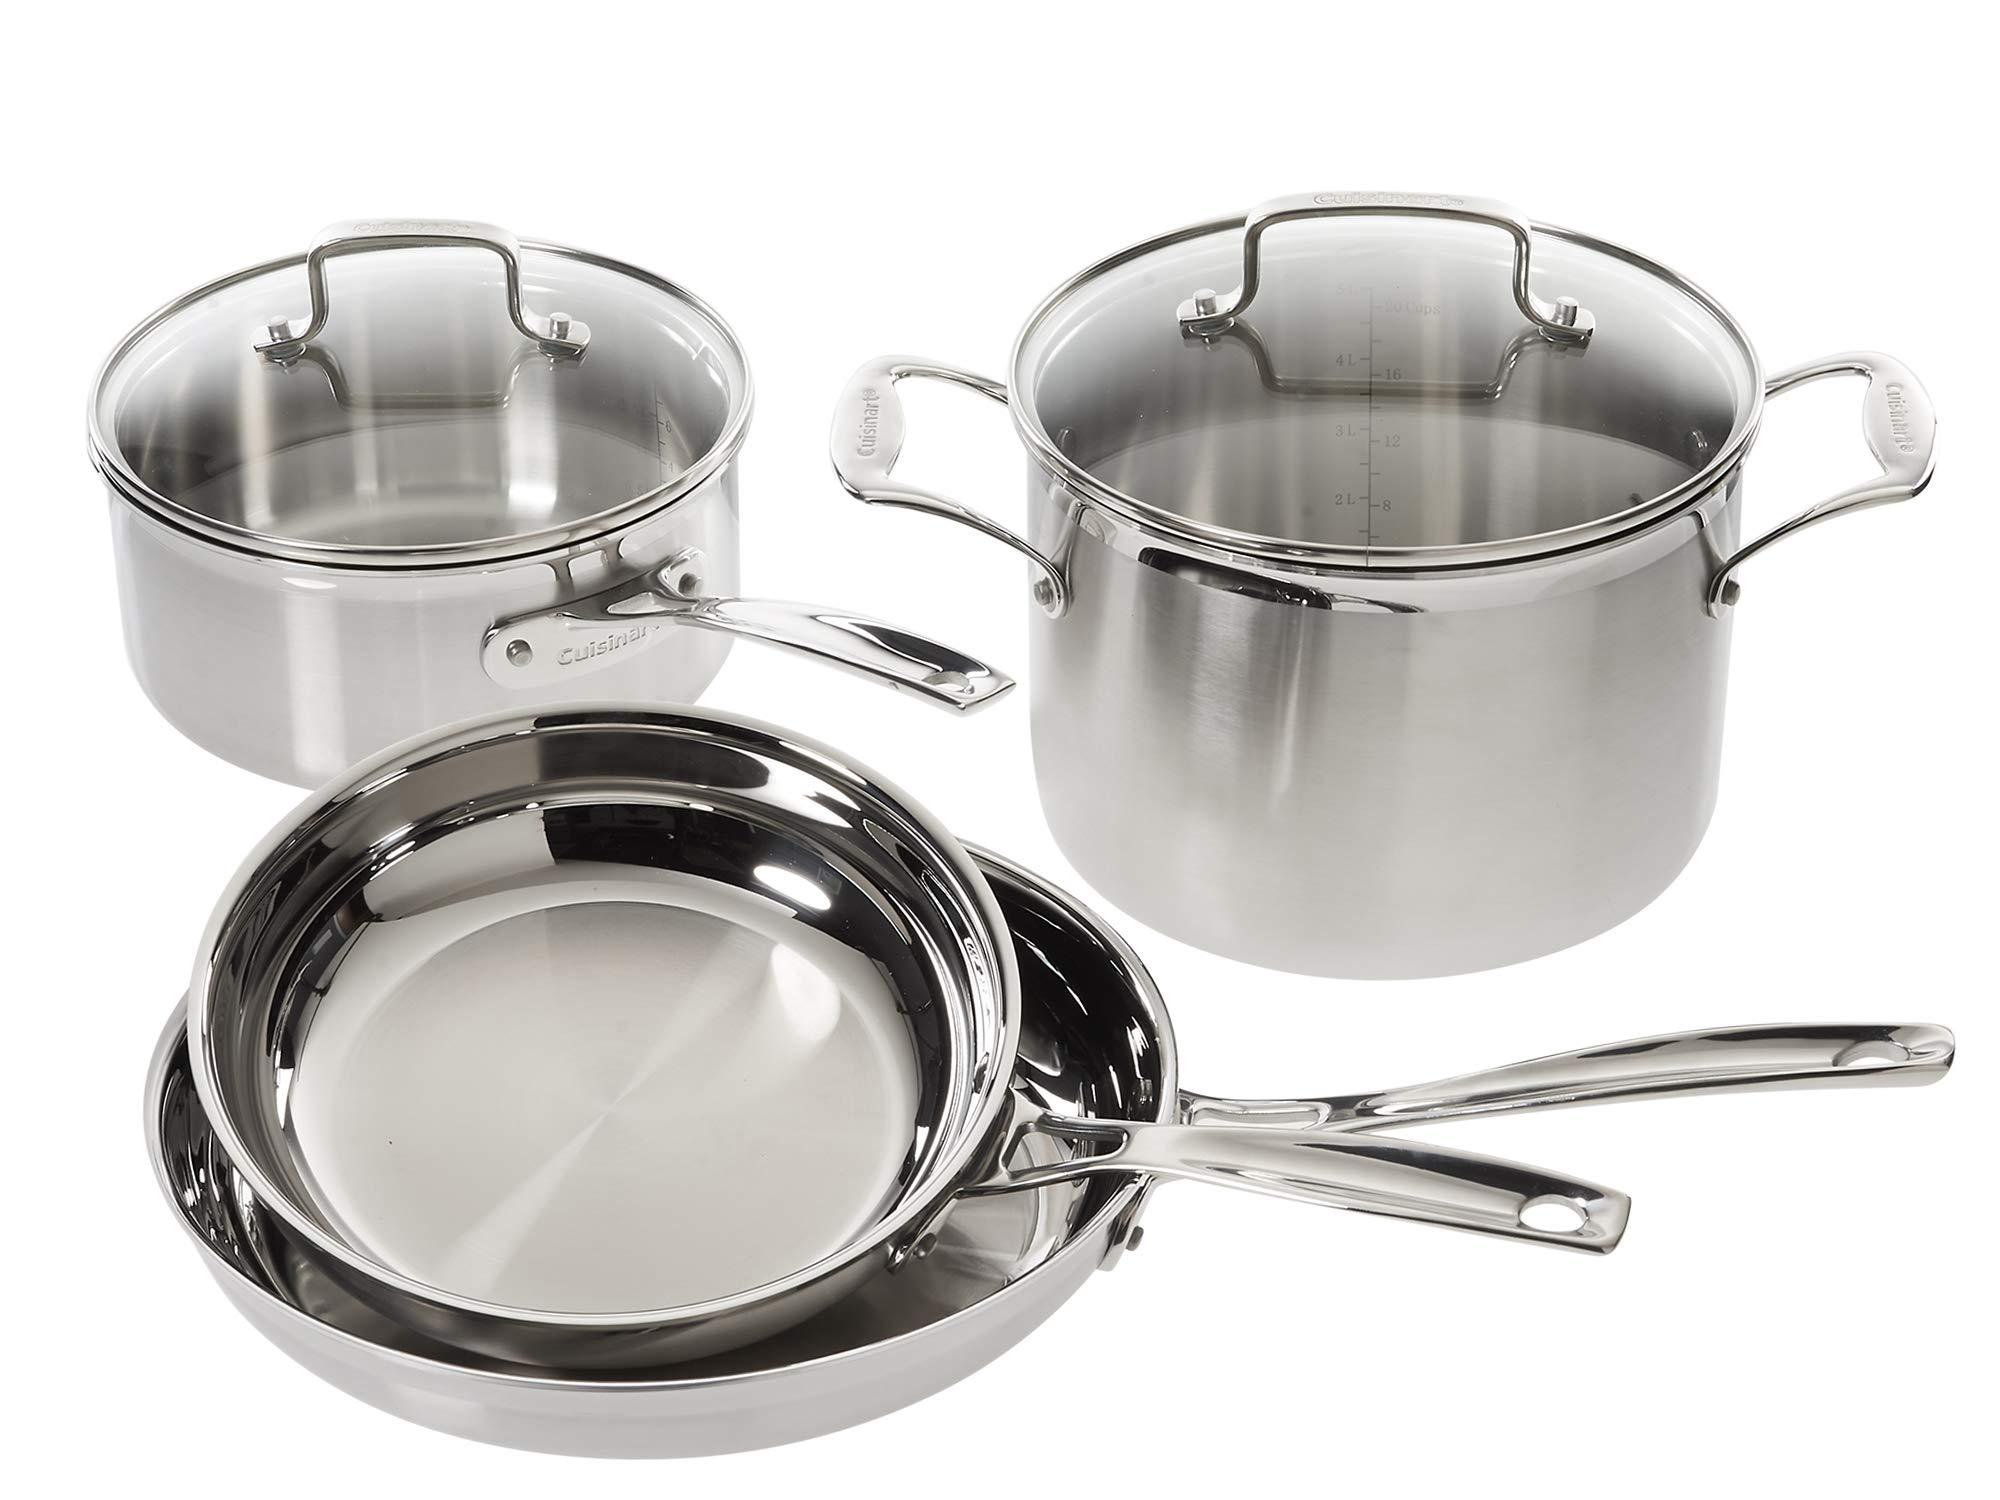 Cuisinart Multiclad Pro Stainless Steel 6-Piece Cookware Set